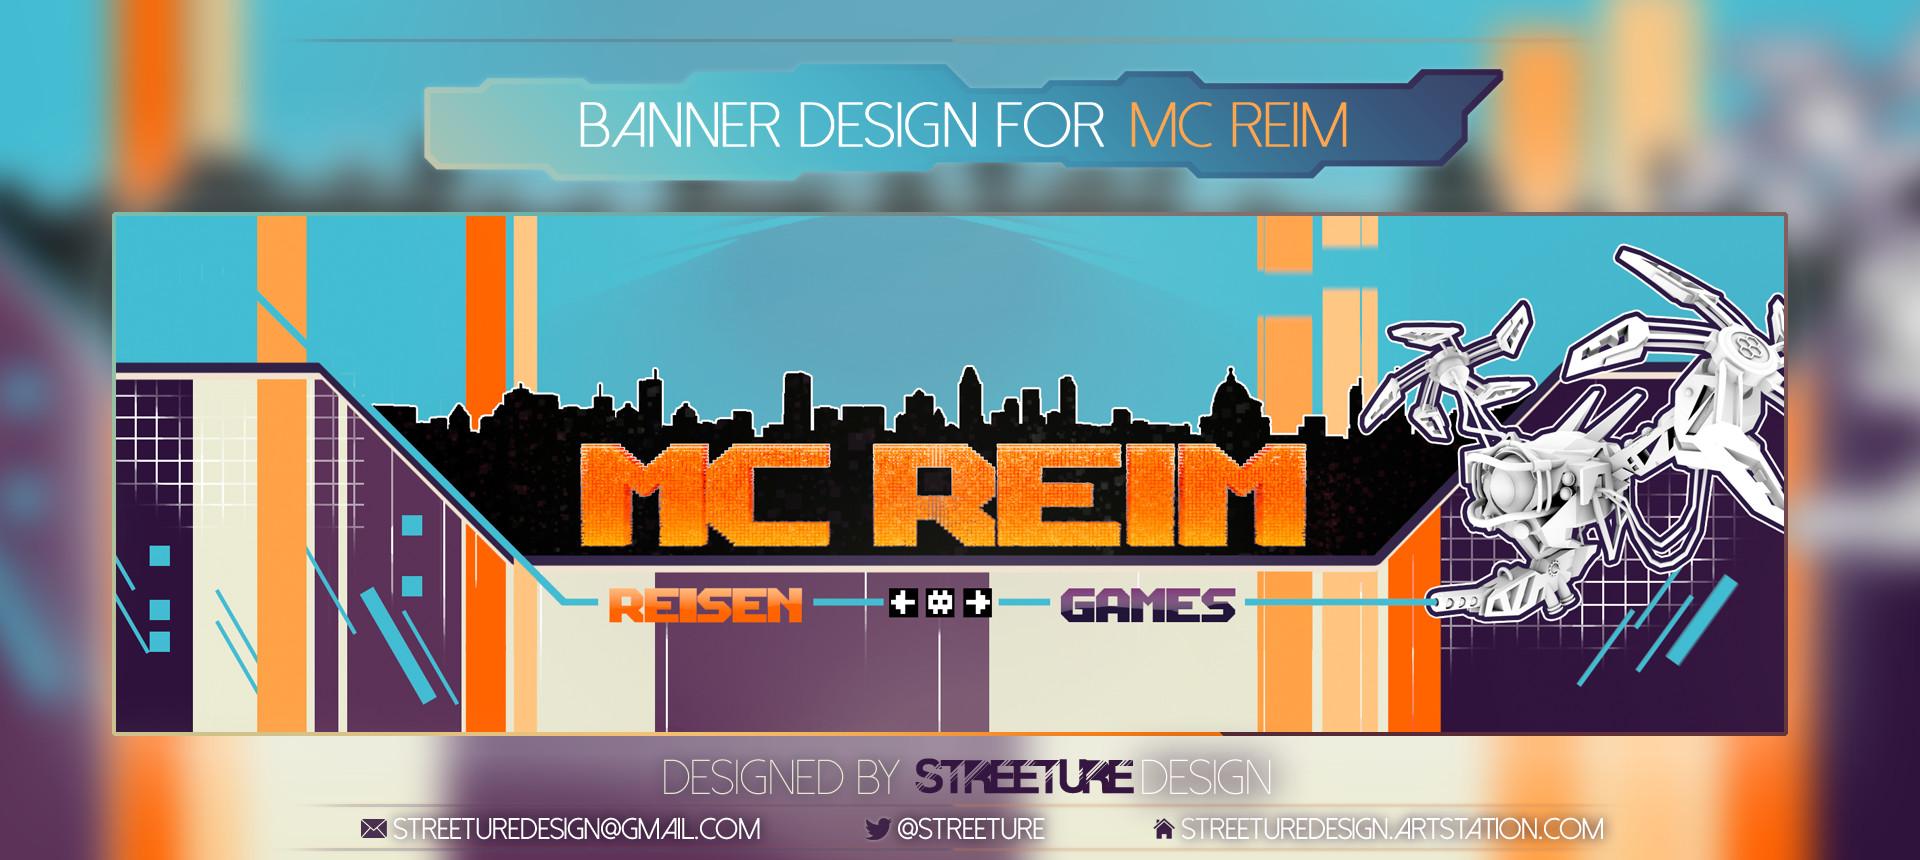 Streeture design bannerpresentationartstation mcreim